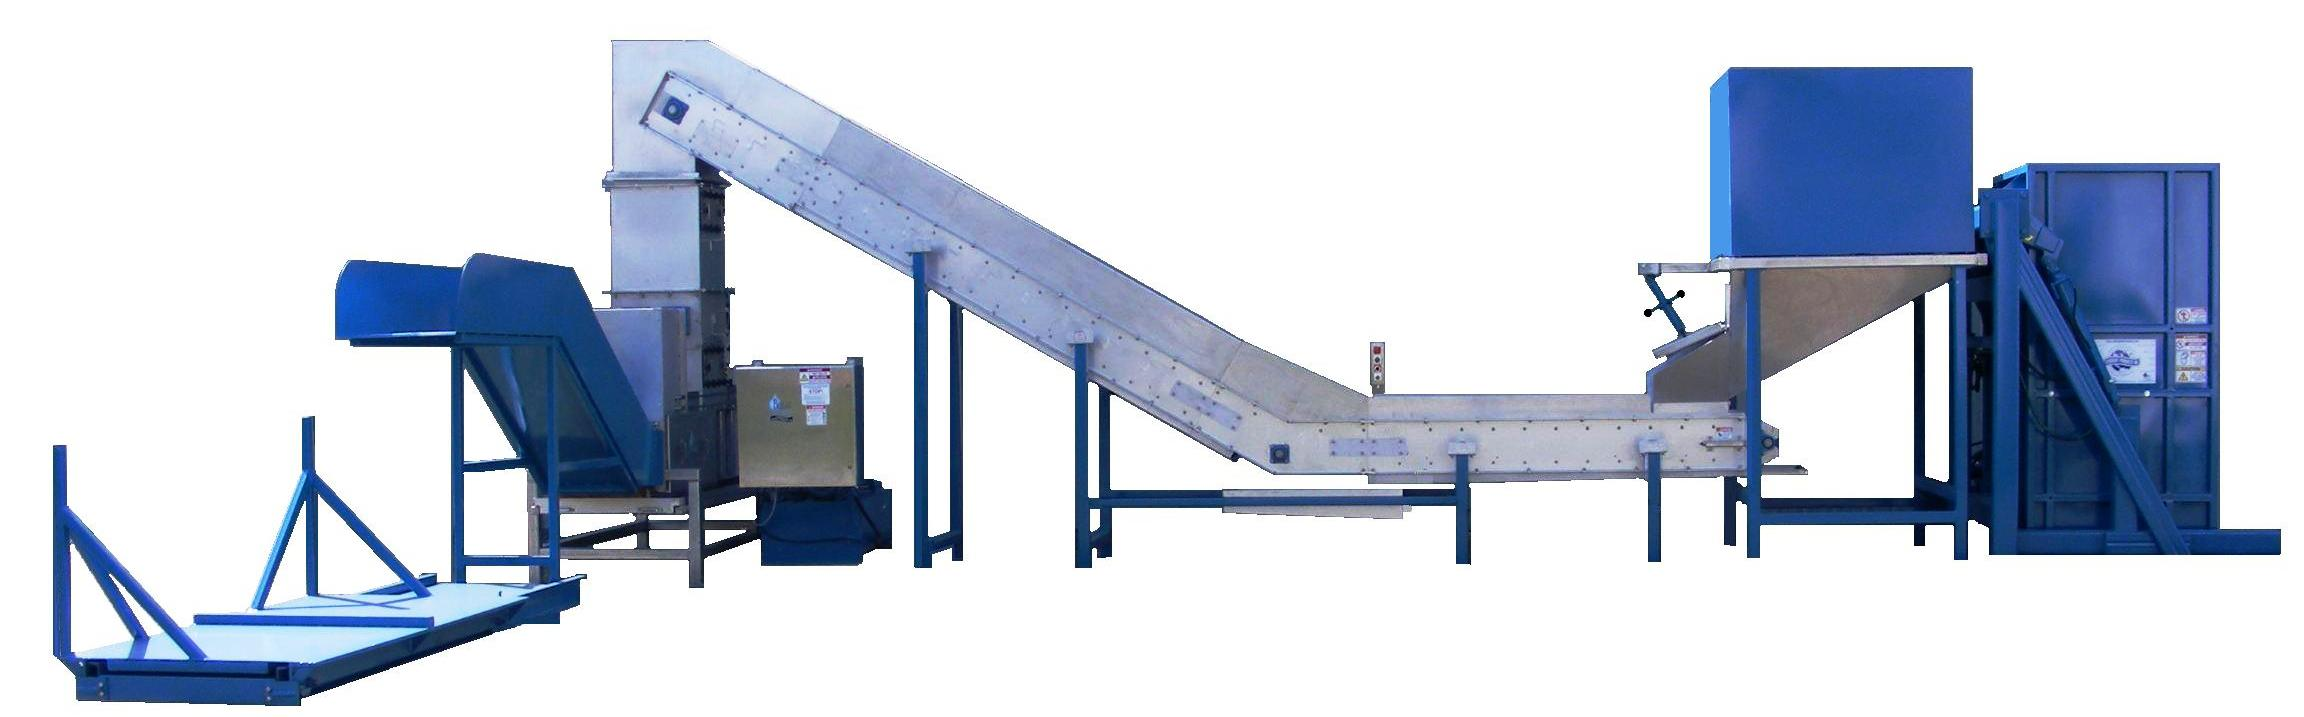 Recyling Equipment